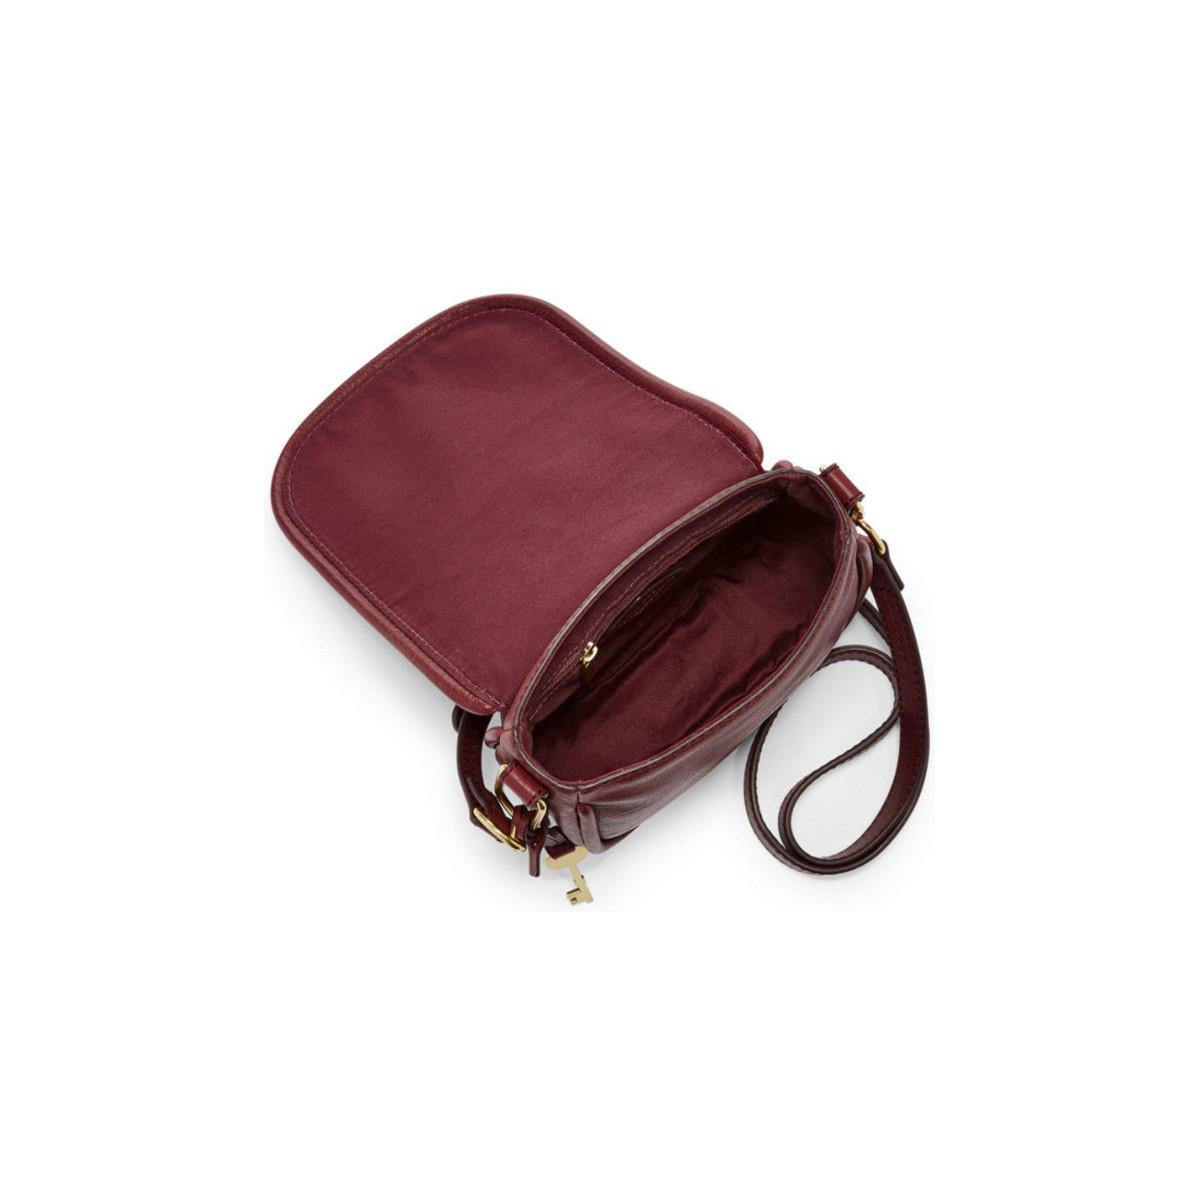 Petite Rouge Rumi Red Fossil Bordeaux Femmes En Cuir Coloris Zb7274216 Bandouliere Besace Sac uTK31cFJl